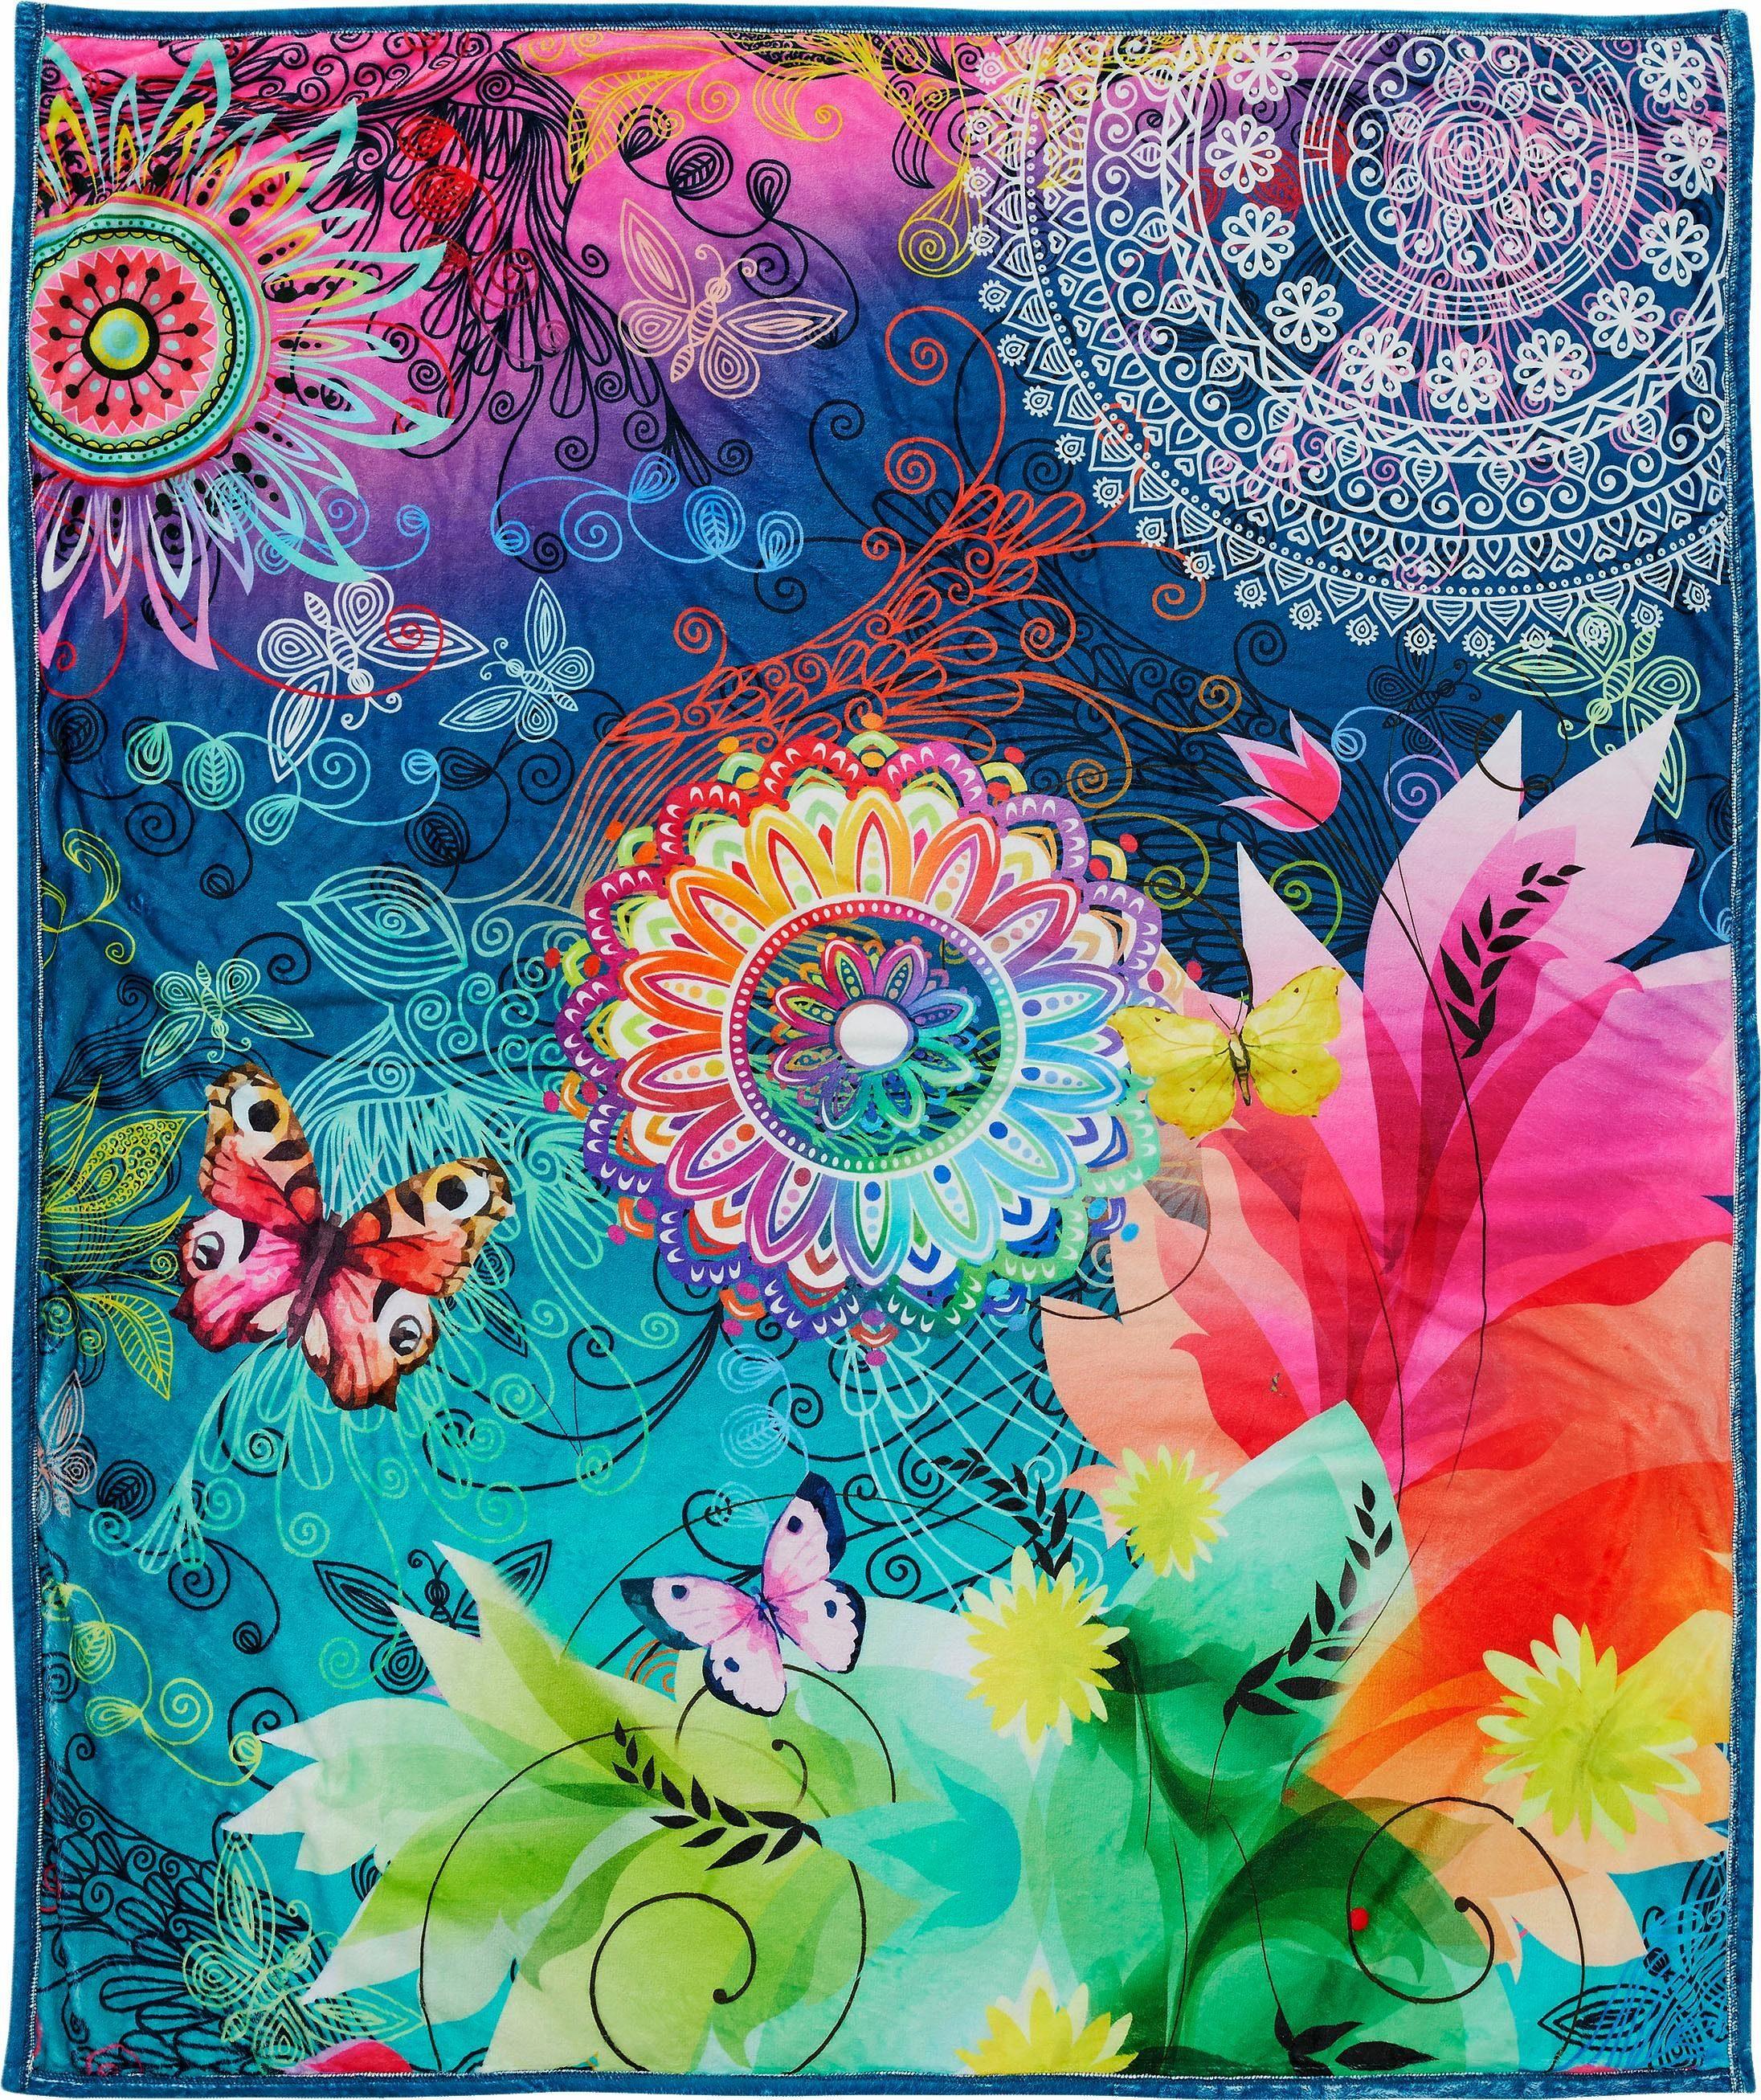 Wohndecke »Parada«, hip, mit tollem Mandala Motiv